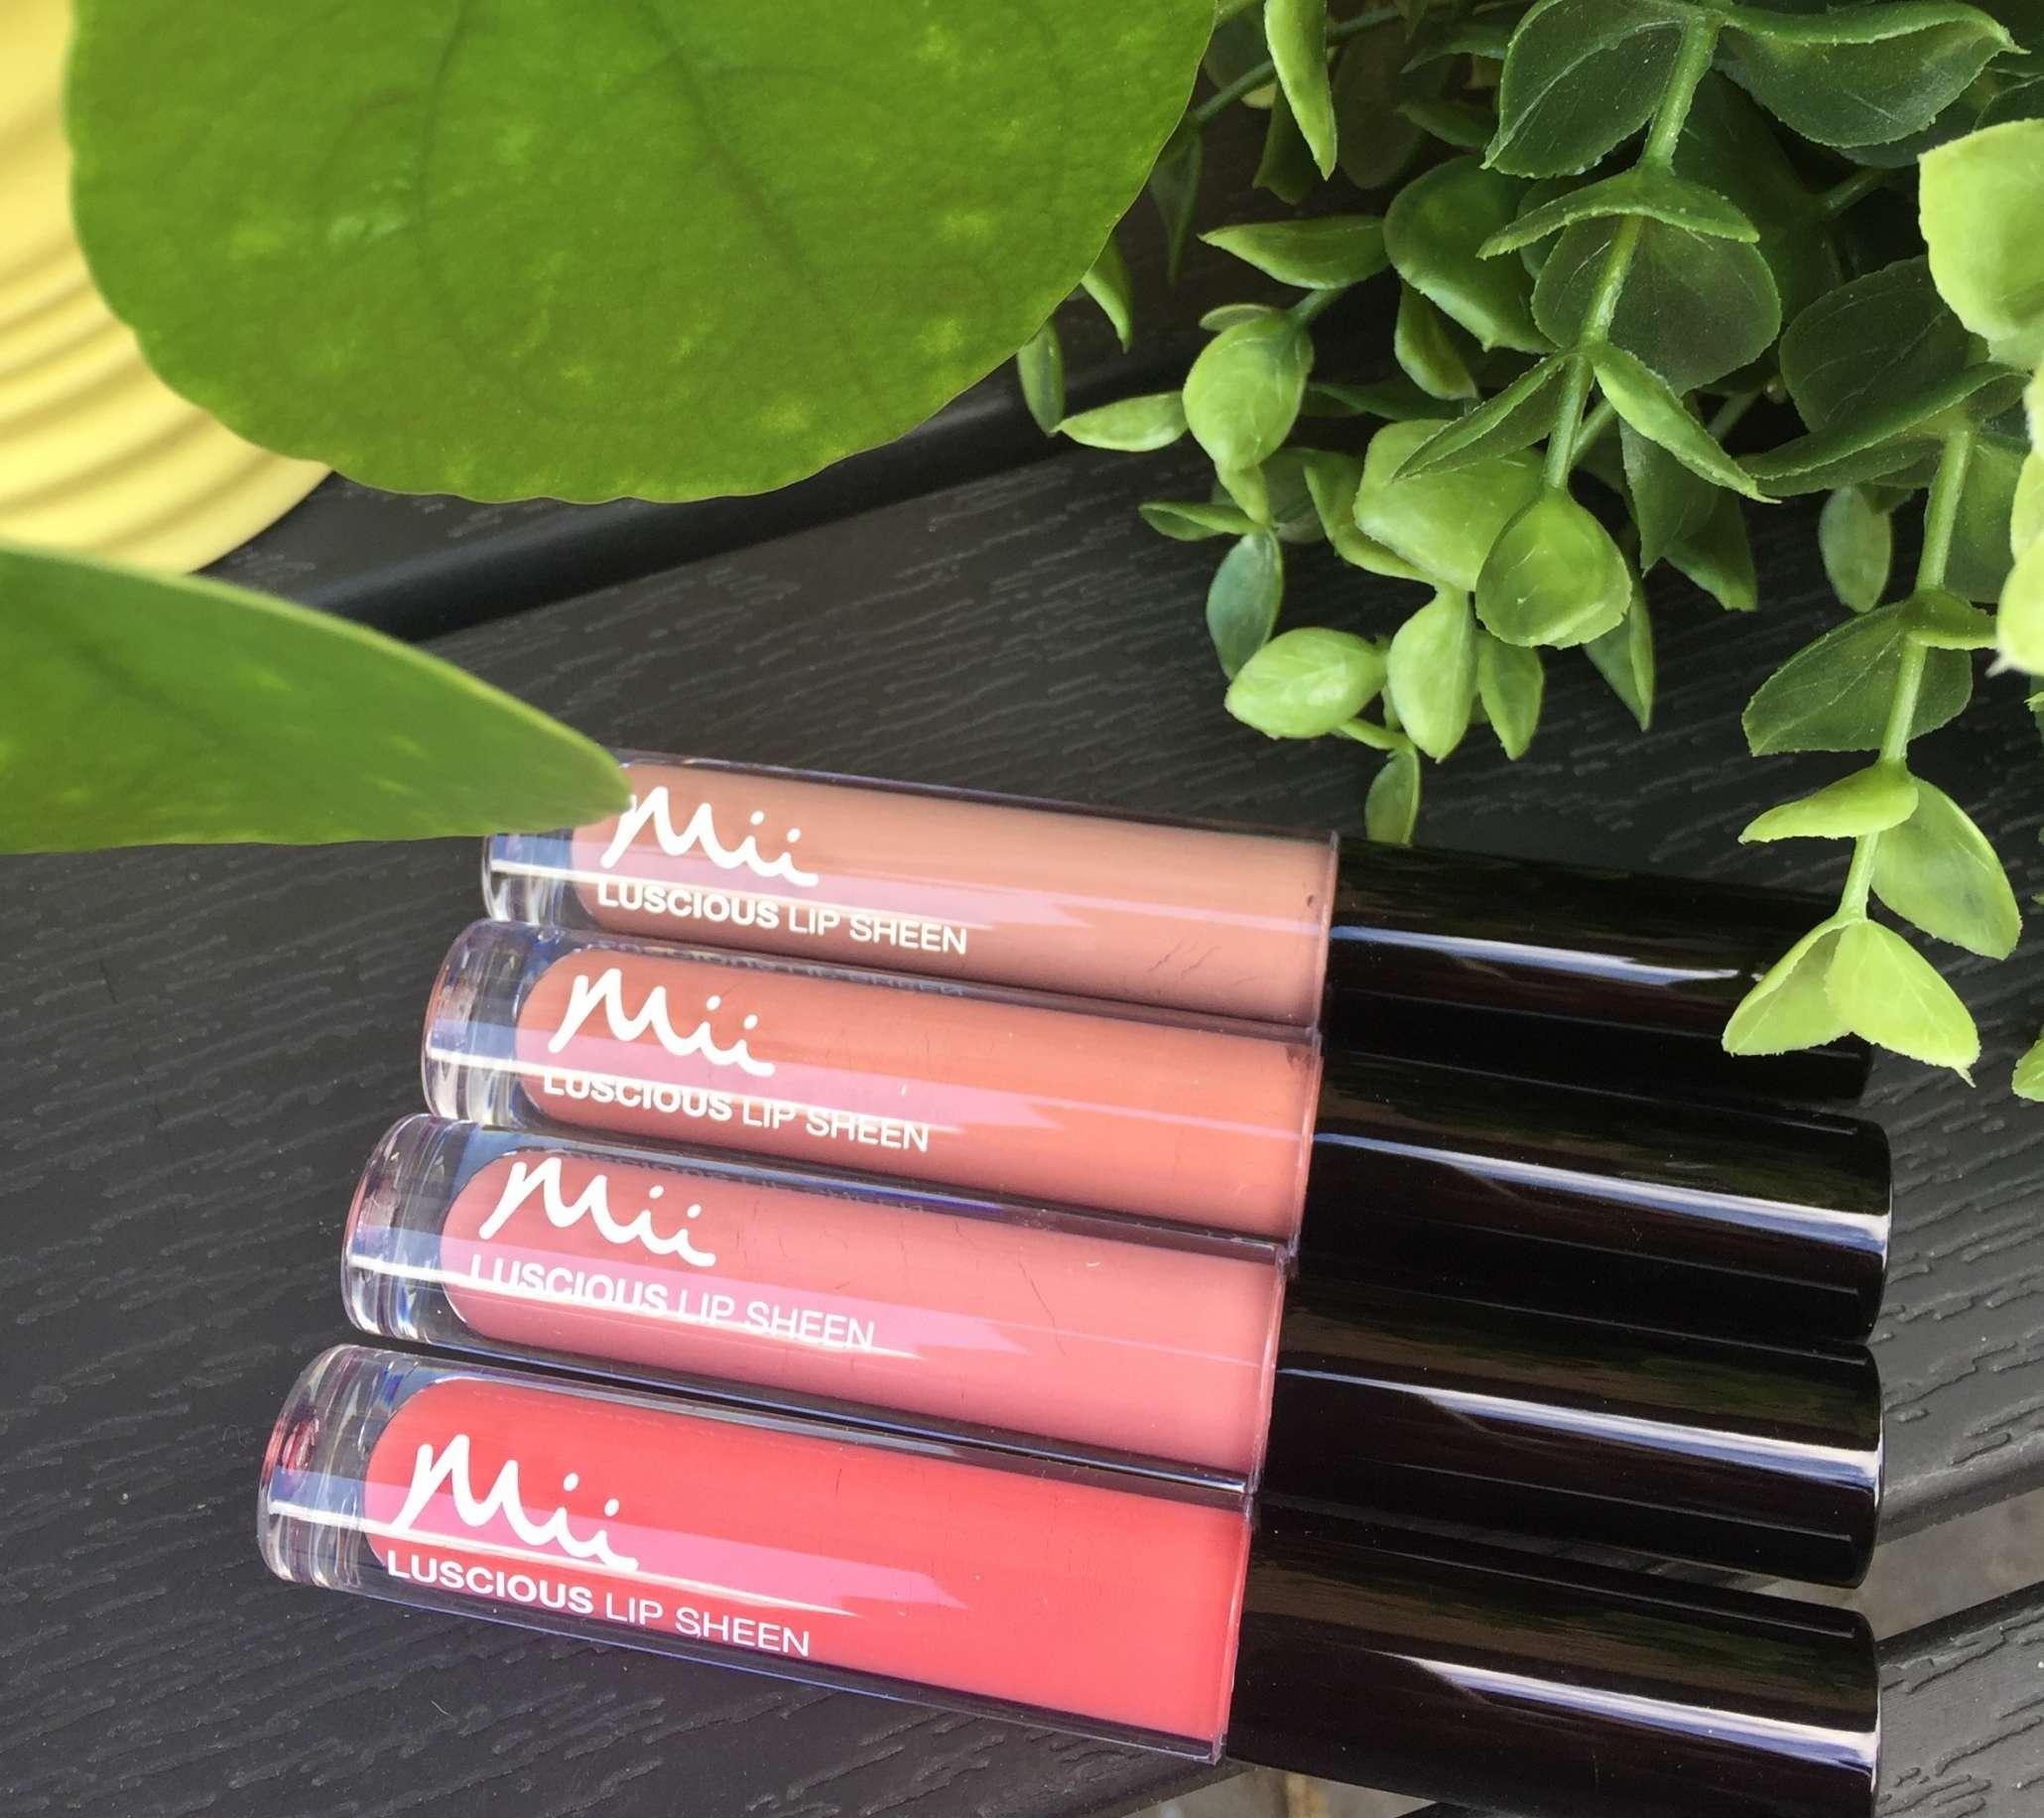 Mii Cosmetic, Mii, Luscious Lip Sheen, Lips, Krummes krummelurer,